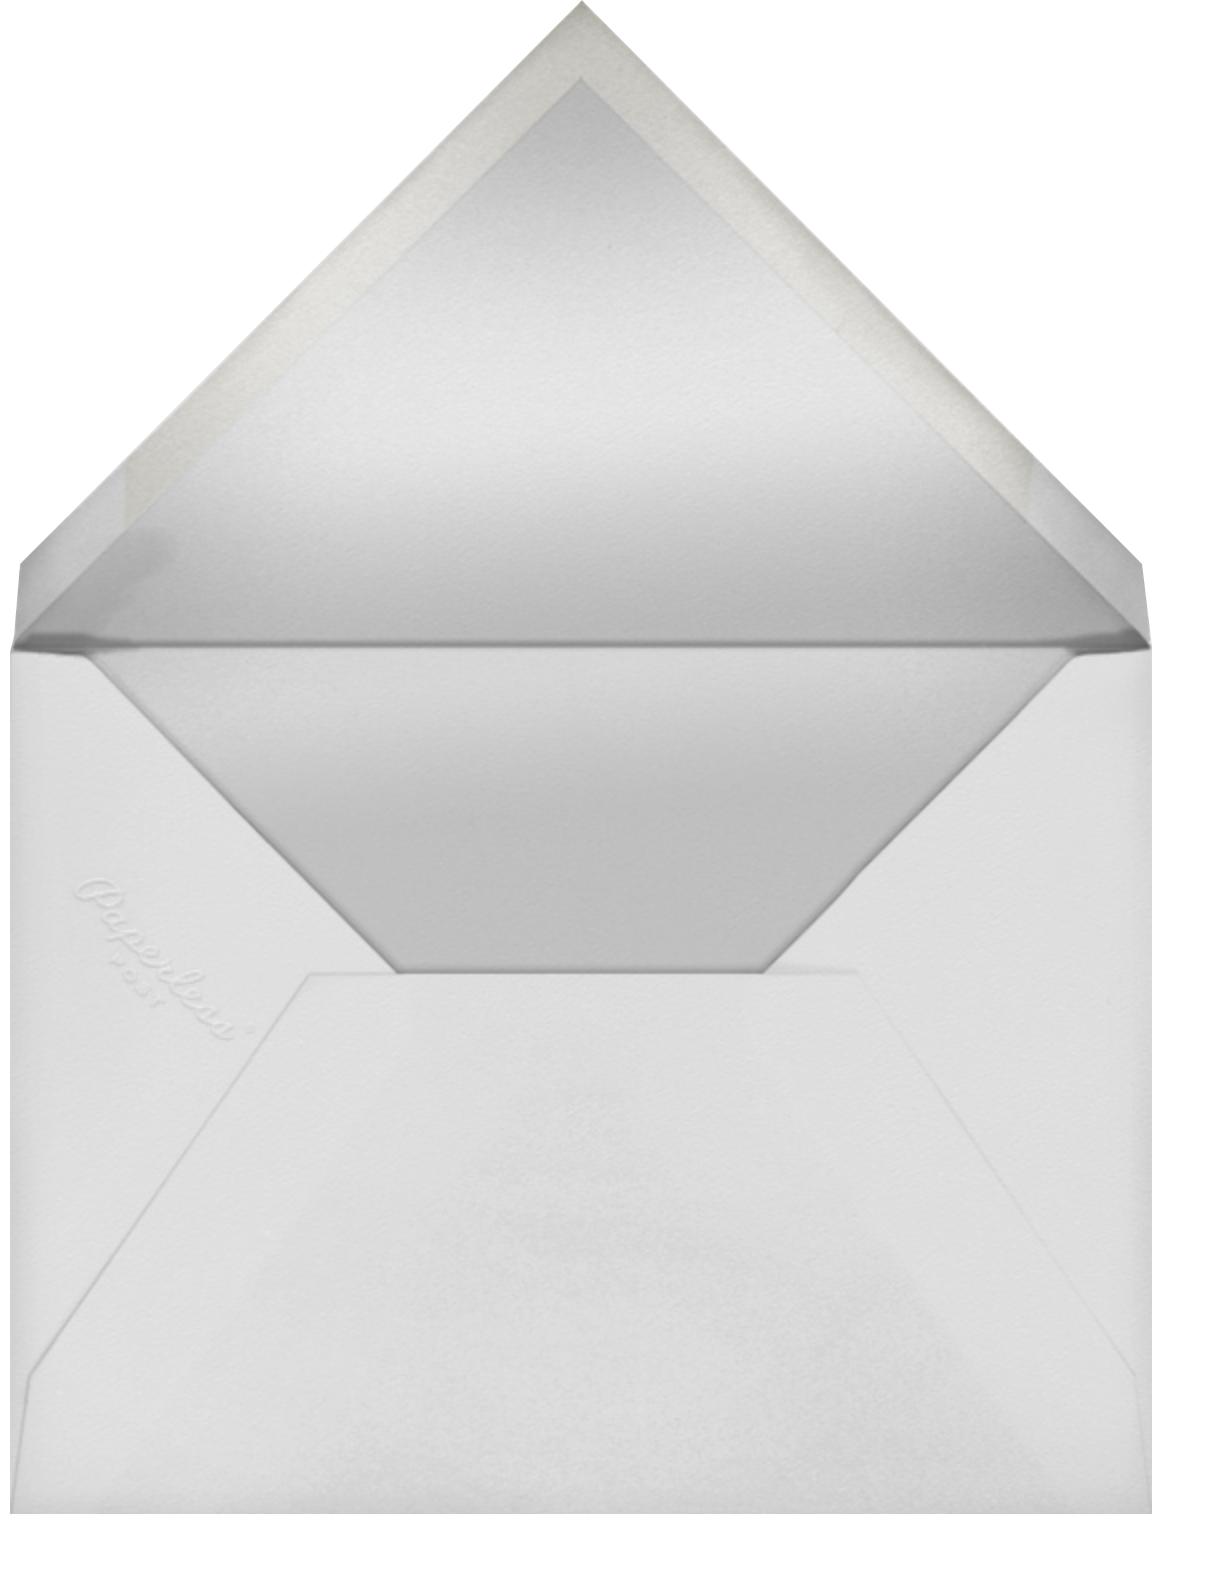 Chronology (Menu) - Black - Paperless Post - Menus - envelope back